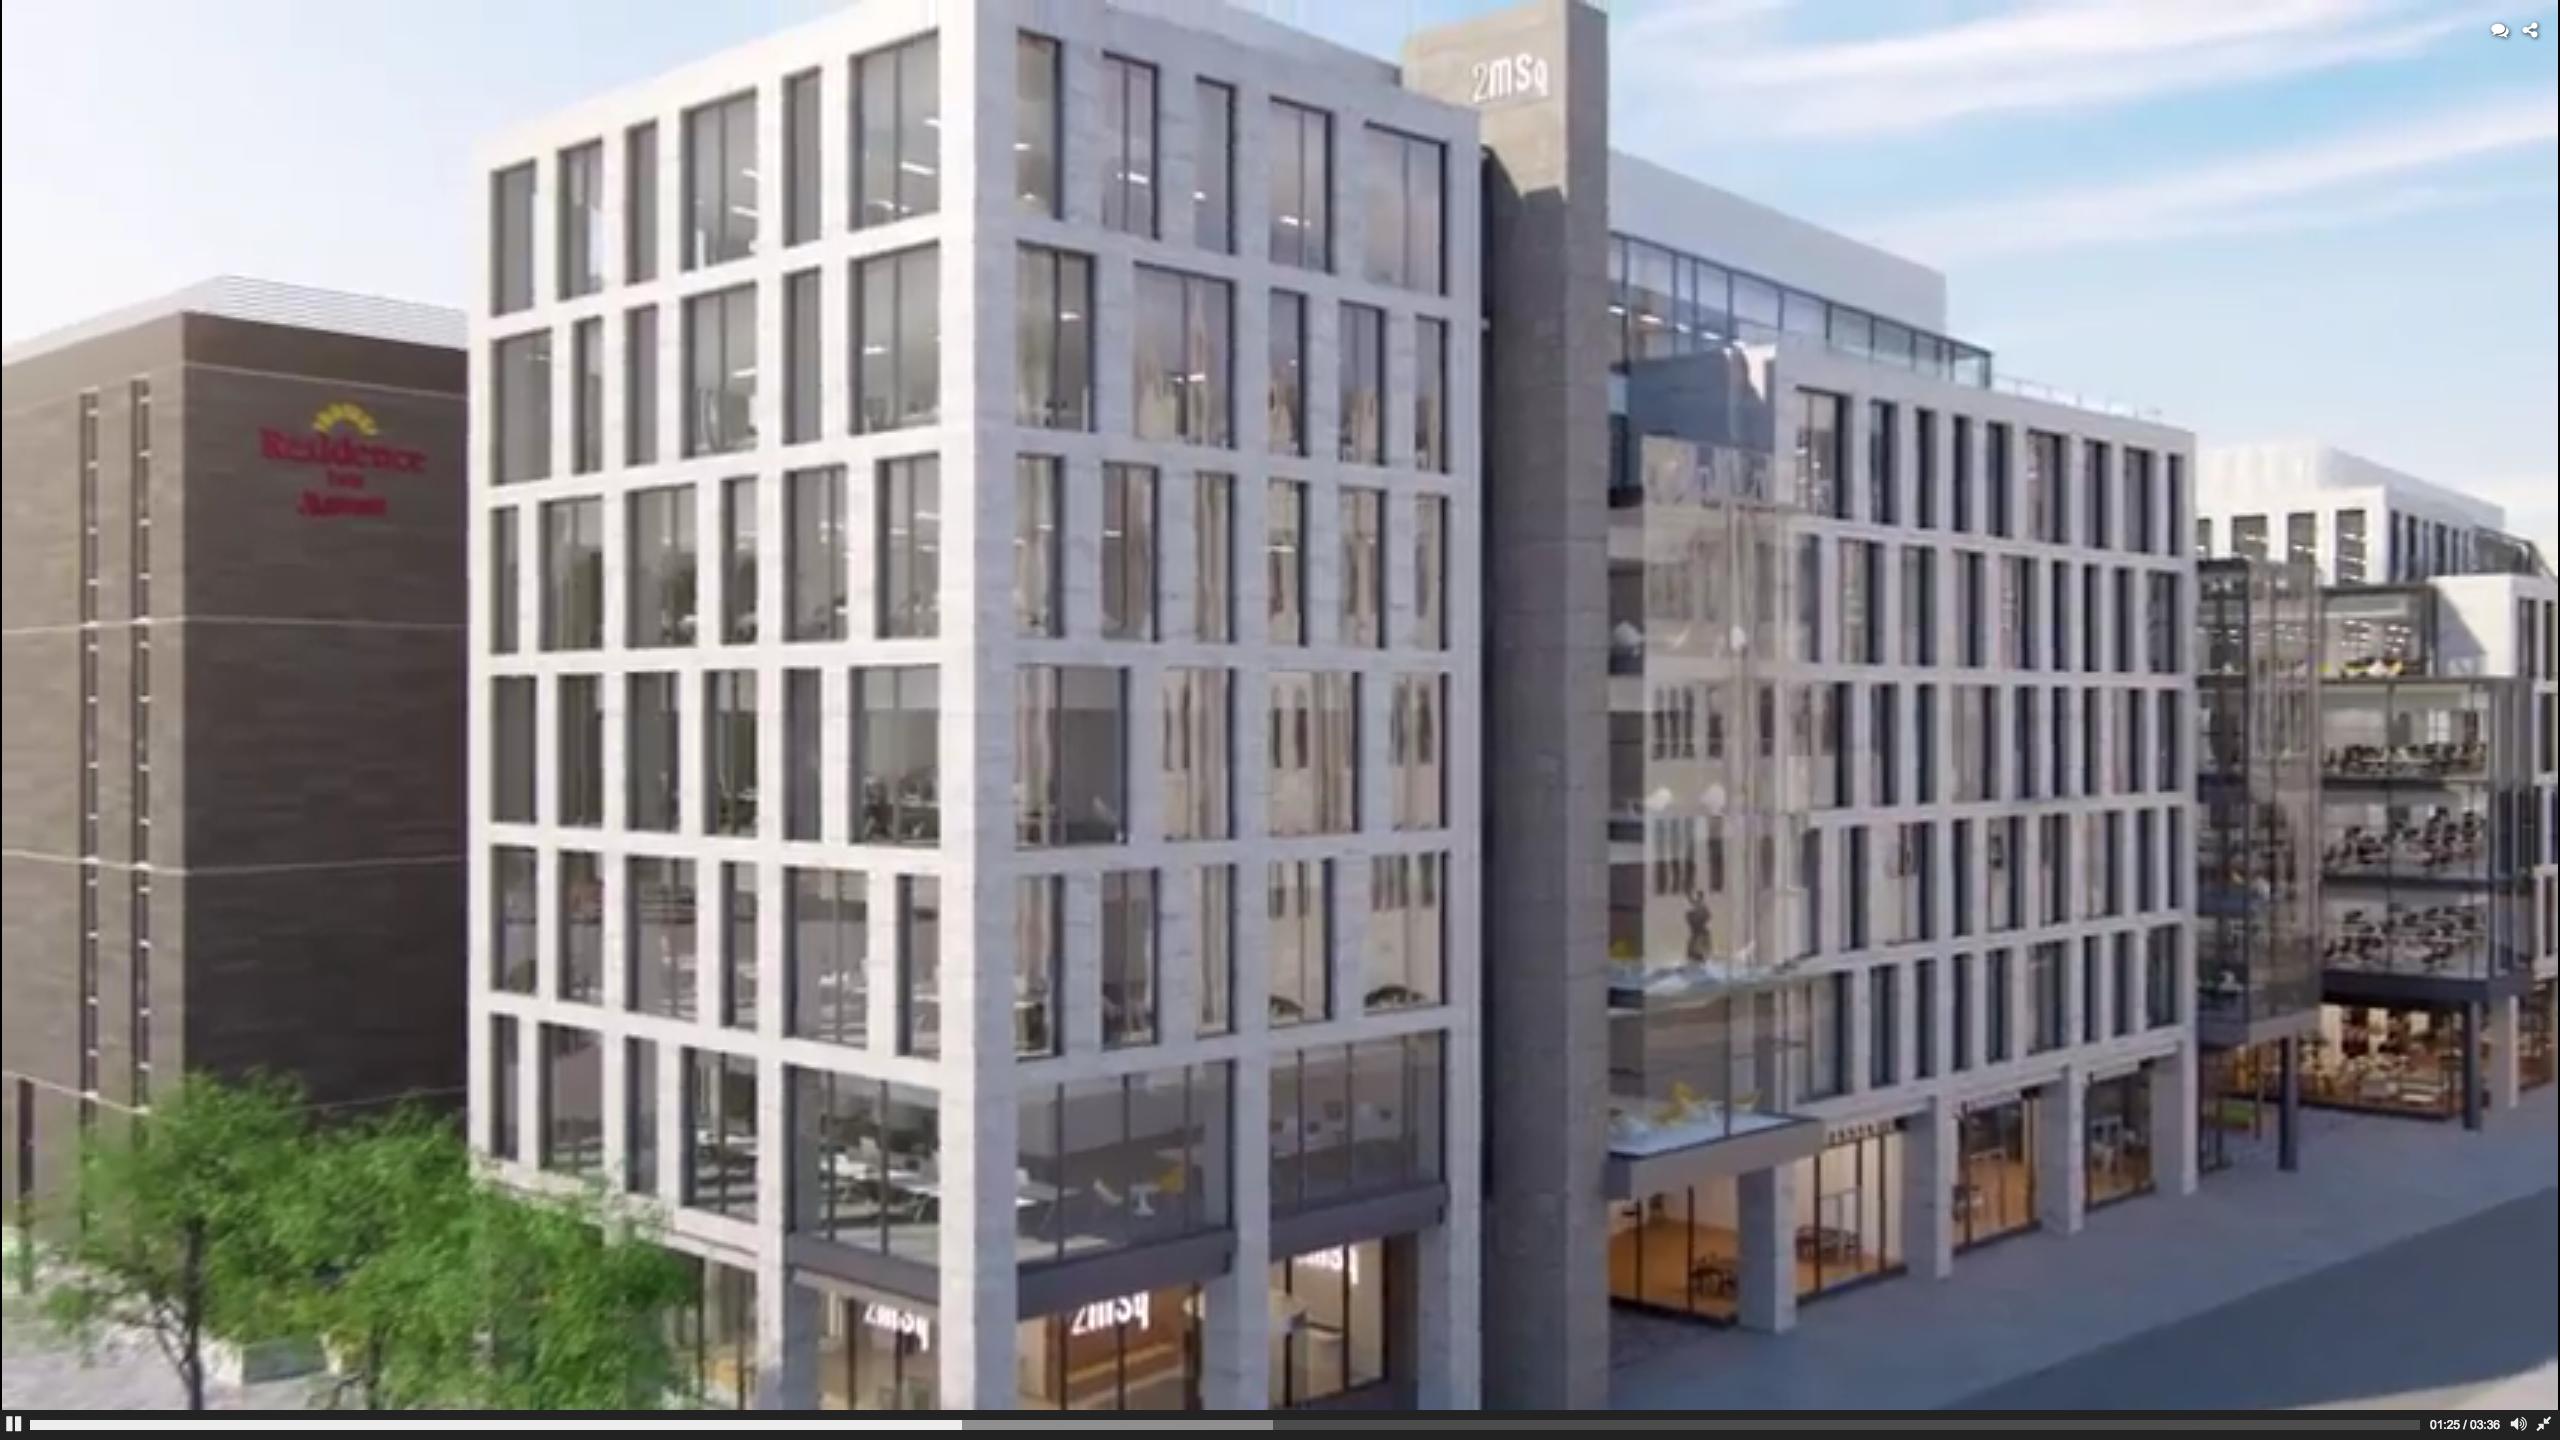 A screenshot from the new Marischal Square development video